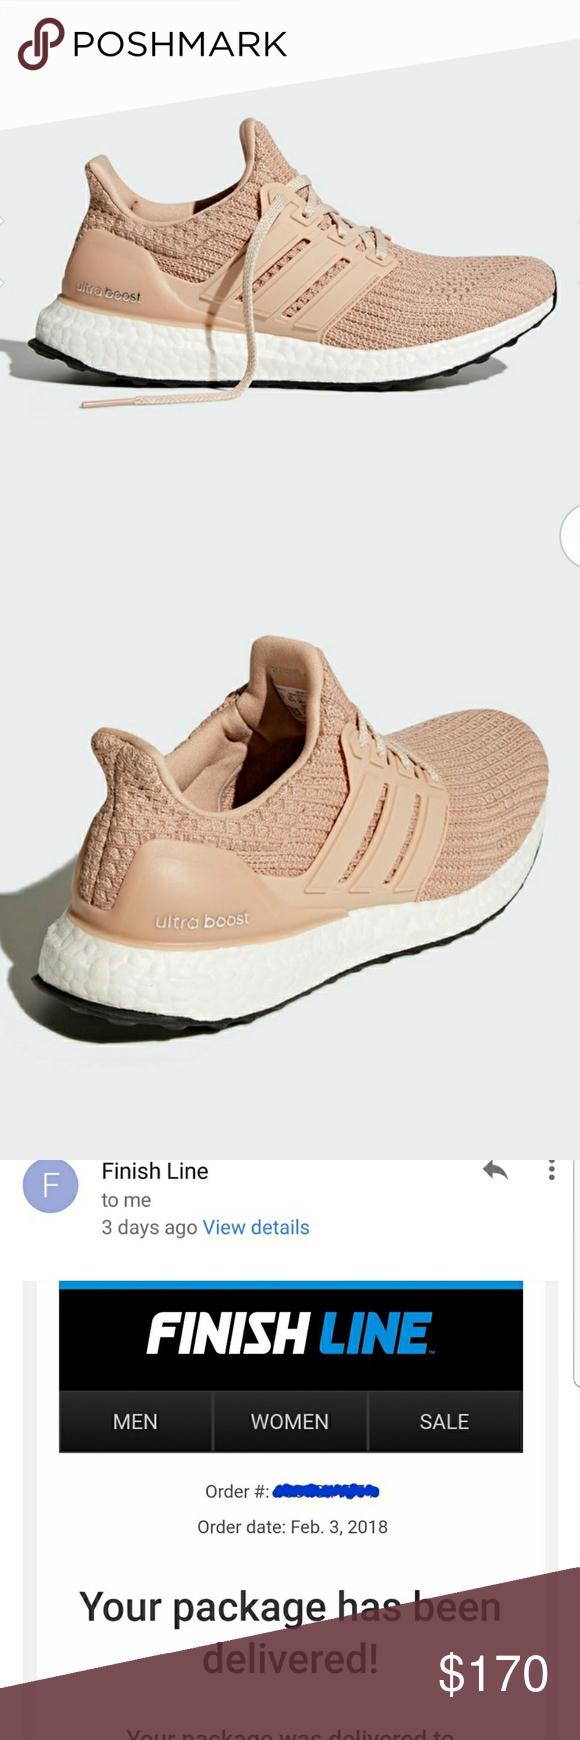 63c95576a Adidas ultra boost womens size 6.5 Ash Pearl color Adidas ultra boost  womens size 6.5 Ash